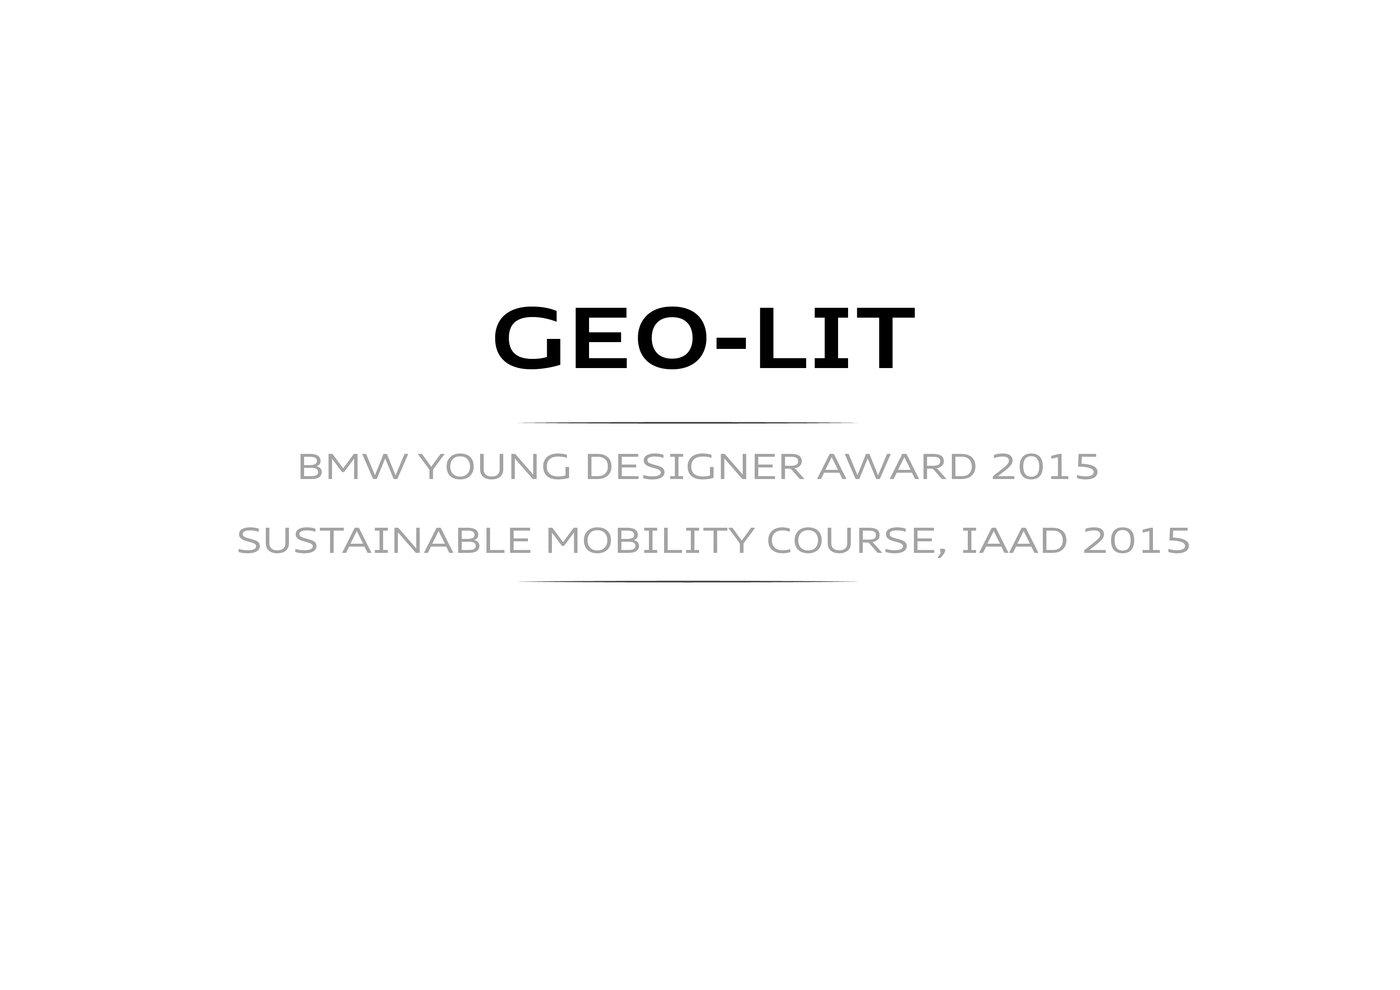 GeoLit SUV Design By Juan José Foc At Coroflotcom - Lit design 2015